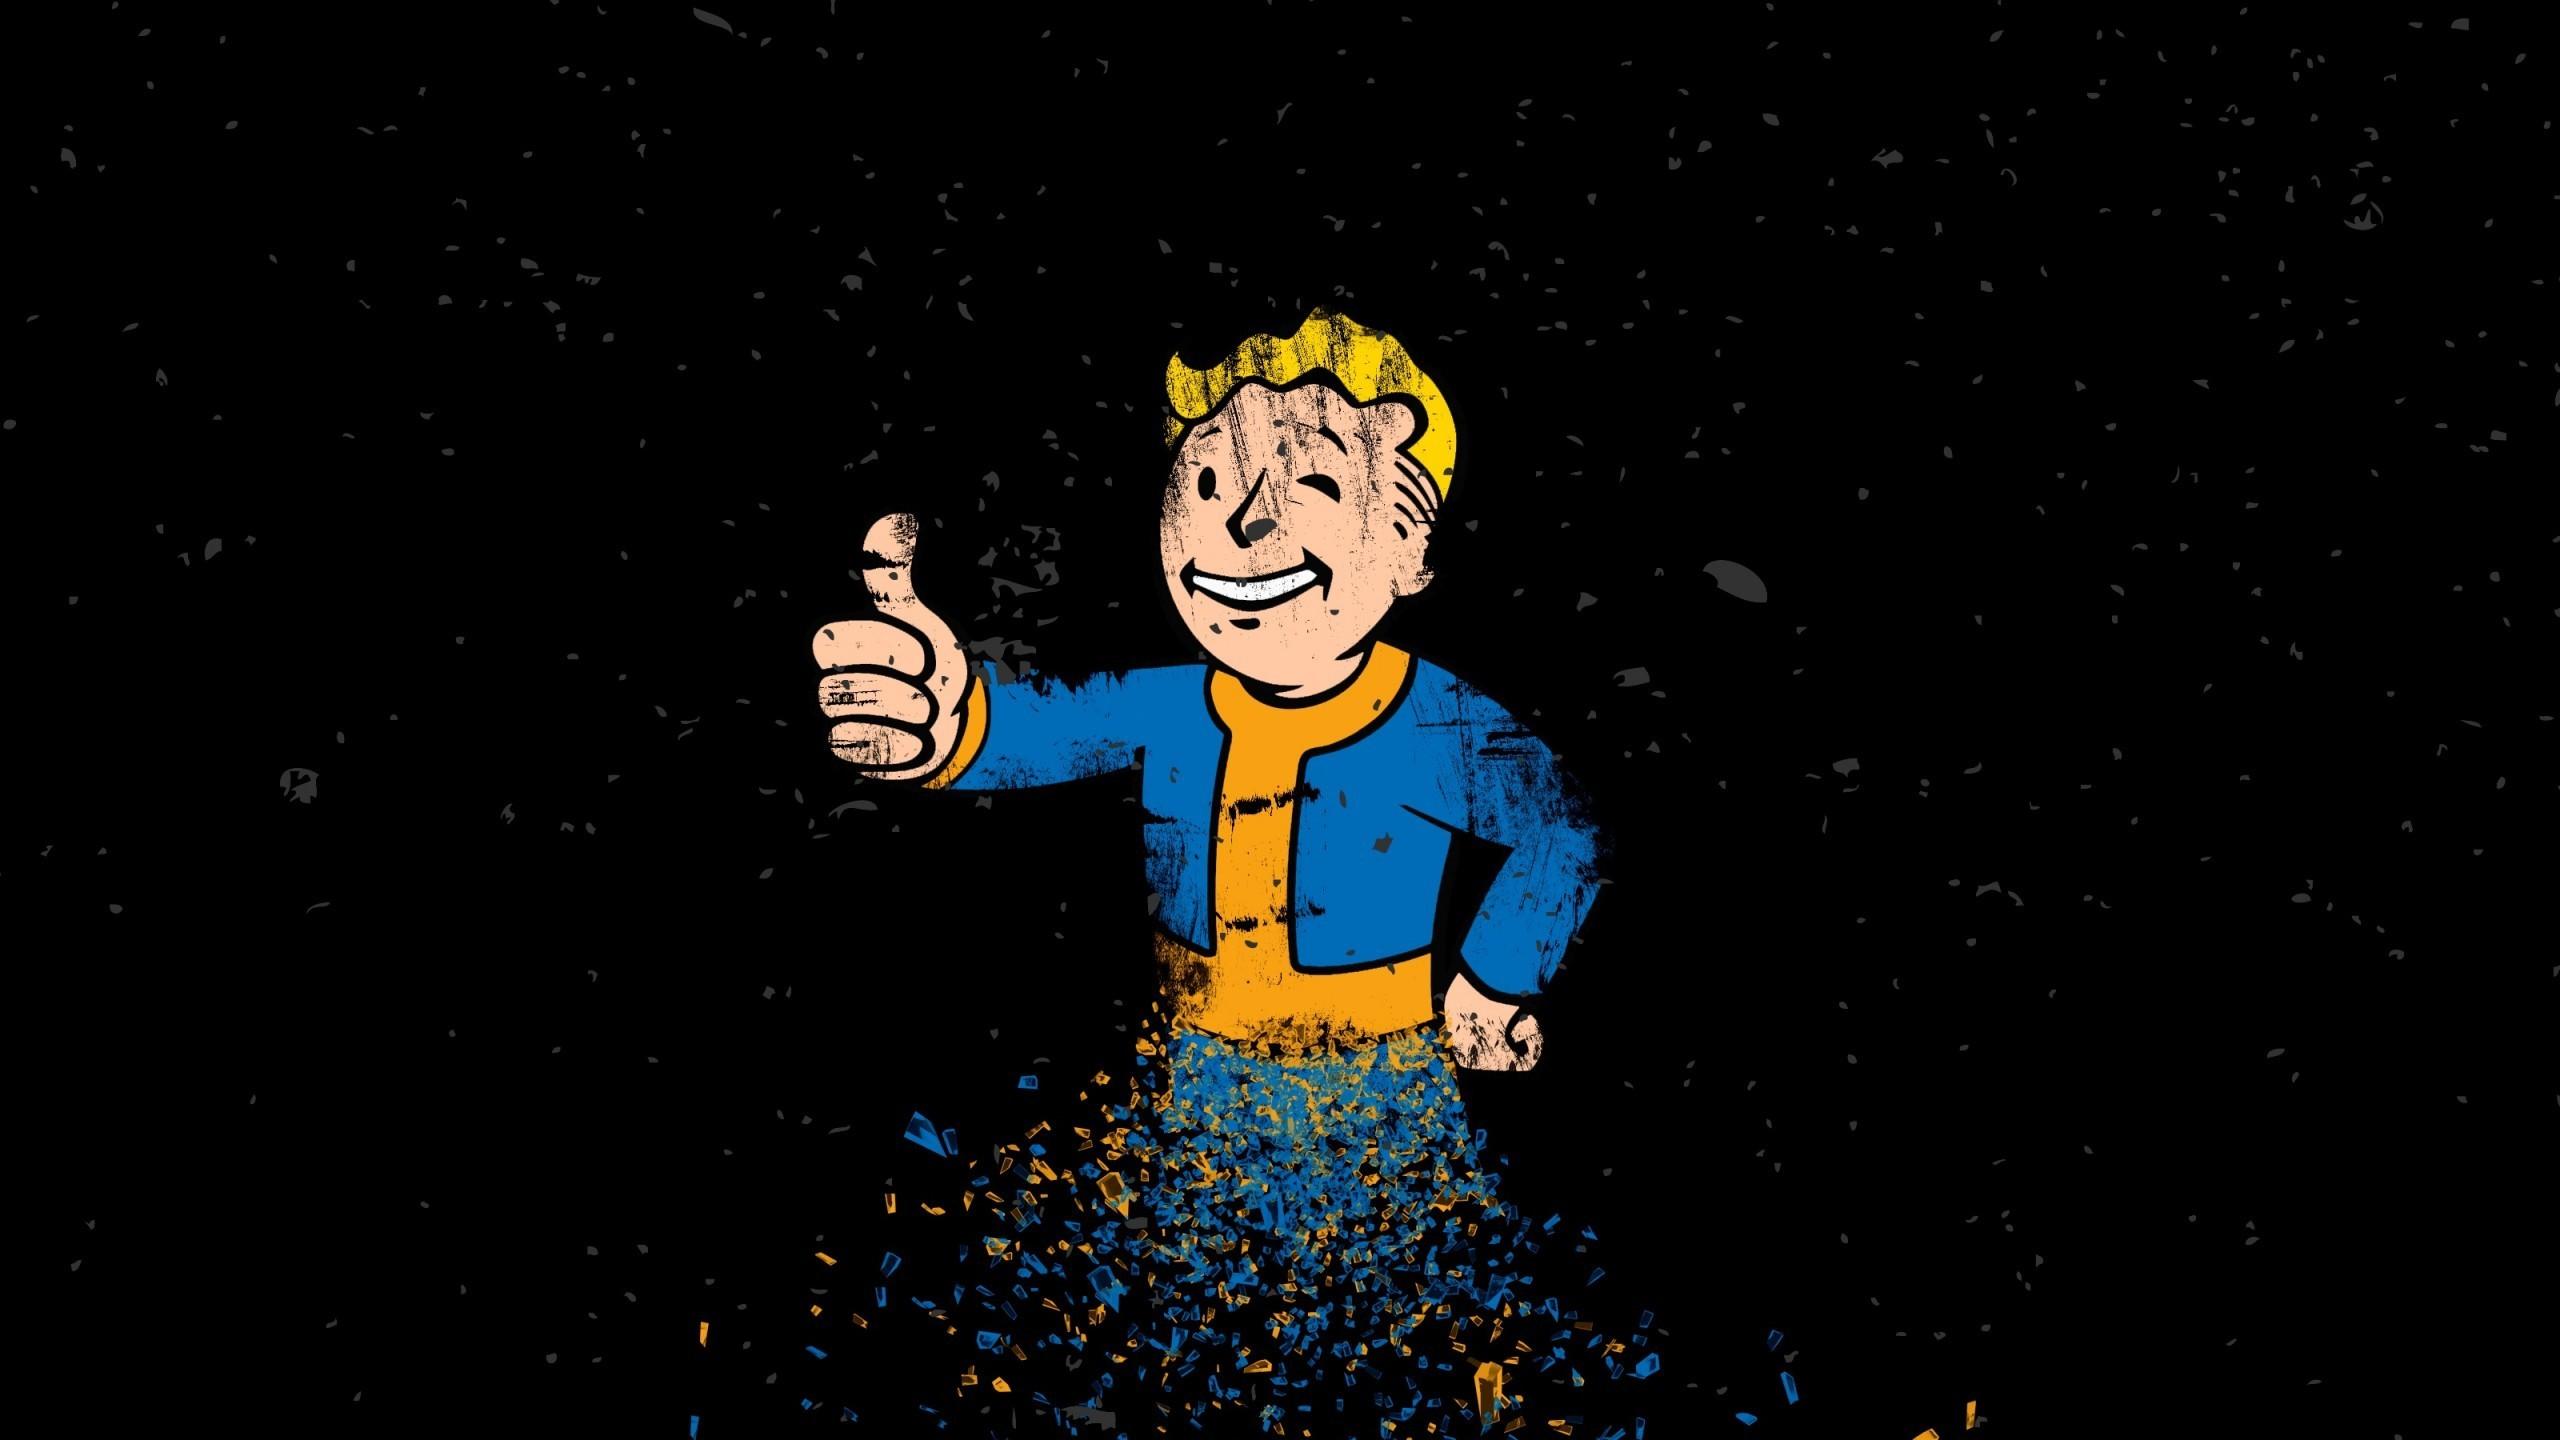 Fall Out Boy Album Wallpaper Fondos De Pantalla Ilustraci 243 N Dibujos Animados Caer